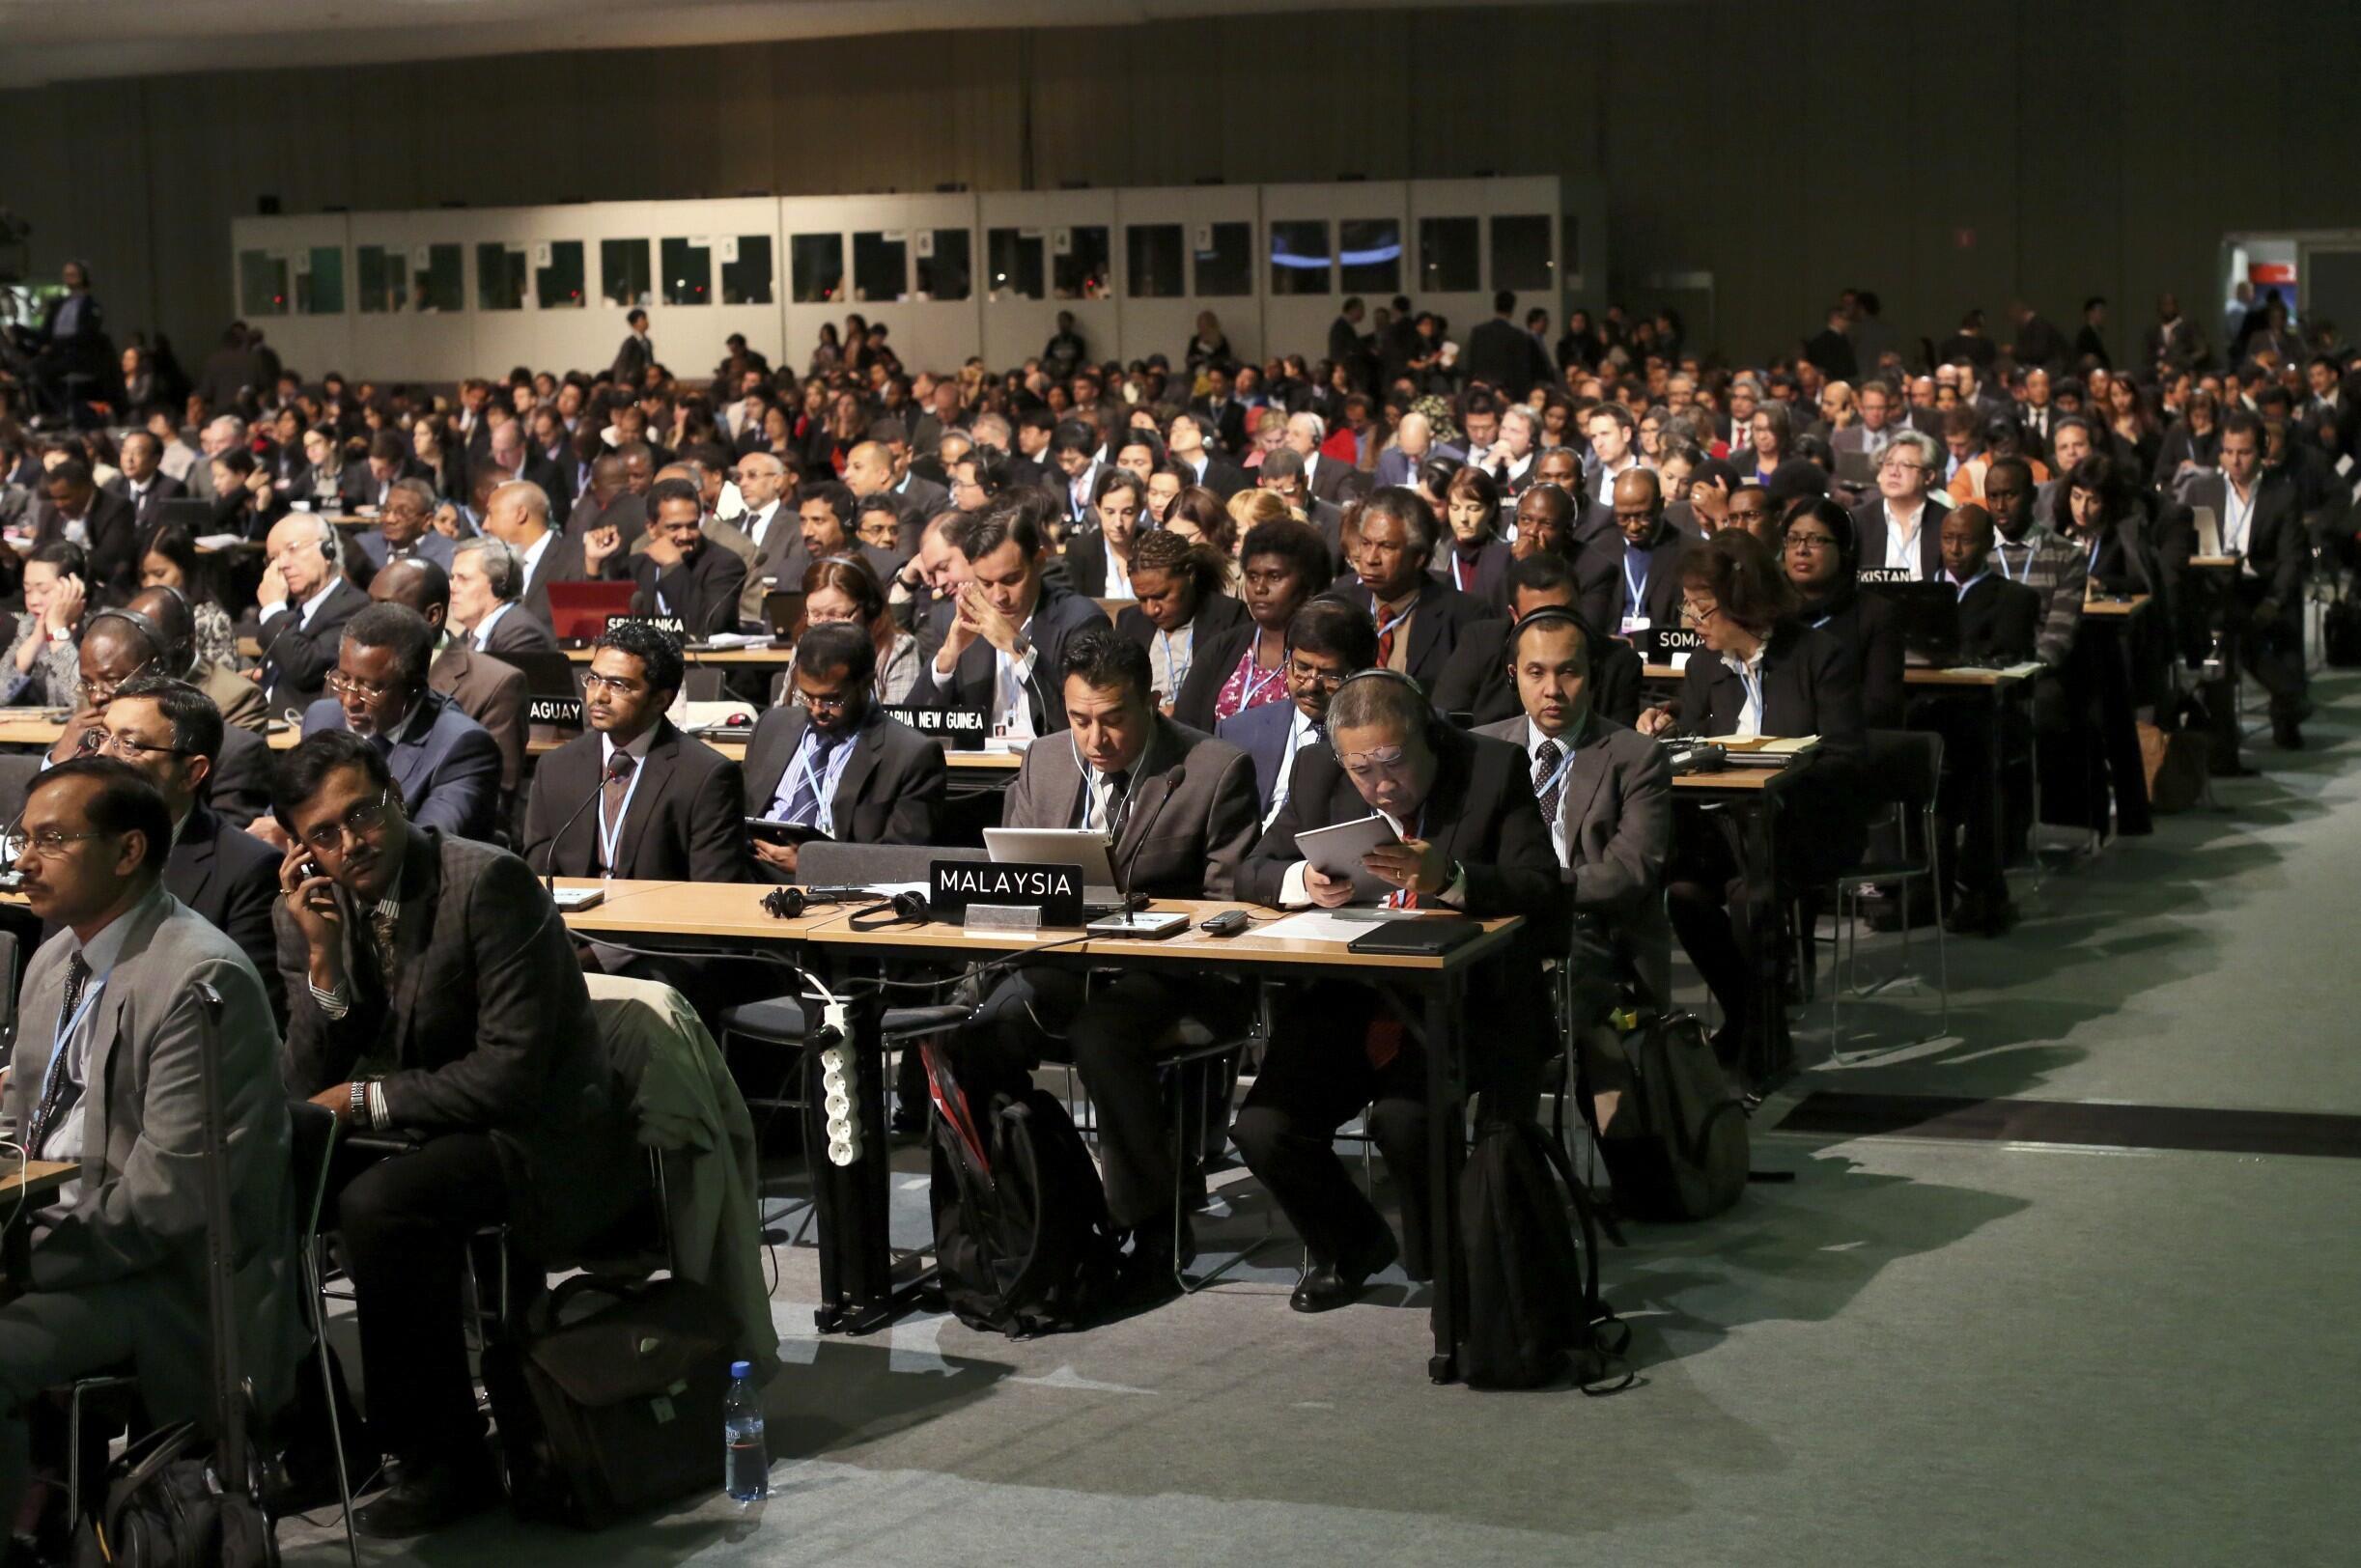 Delegados participam de cerimônia de abertura da COP 19.